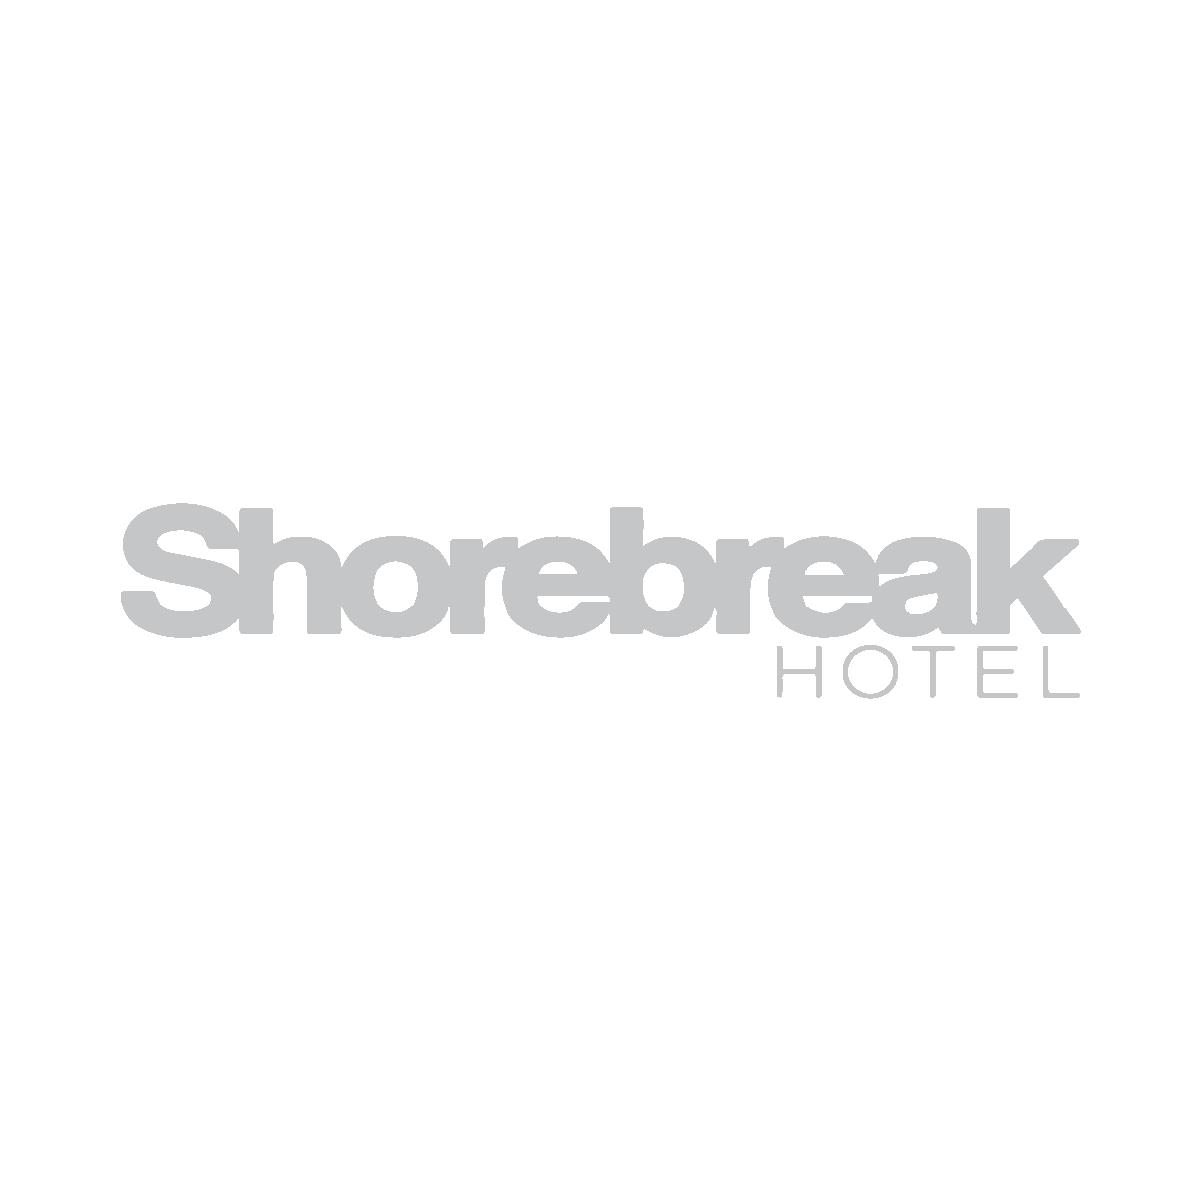 Shorebreak Hotel.png